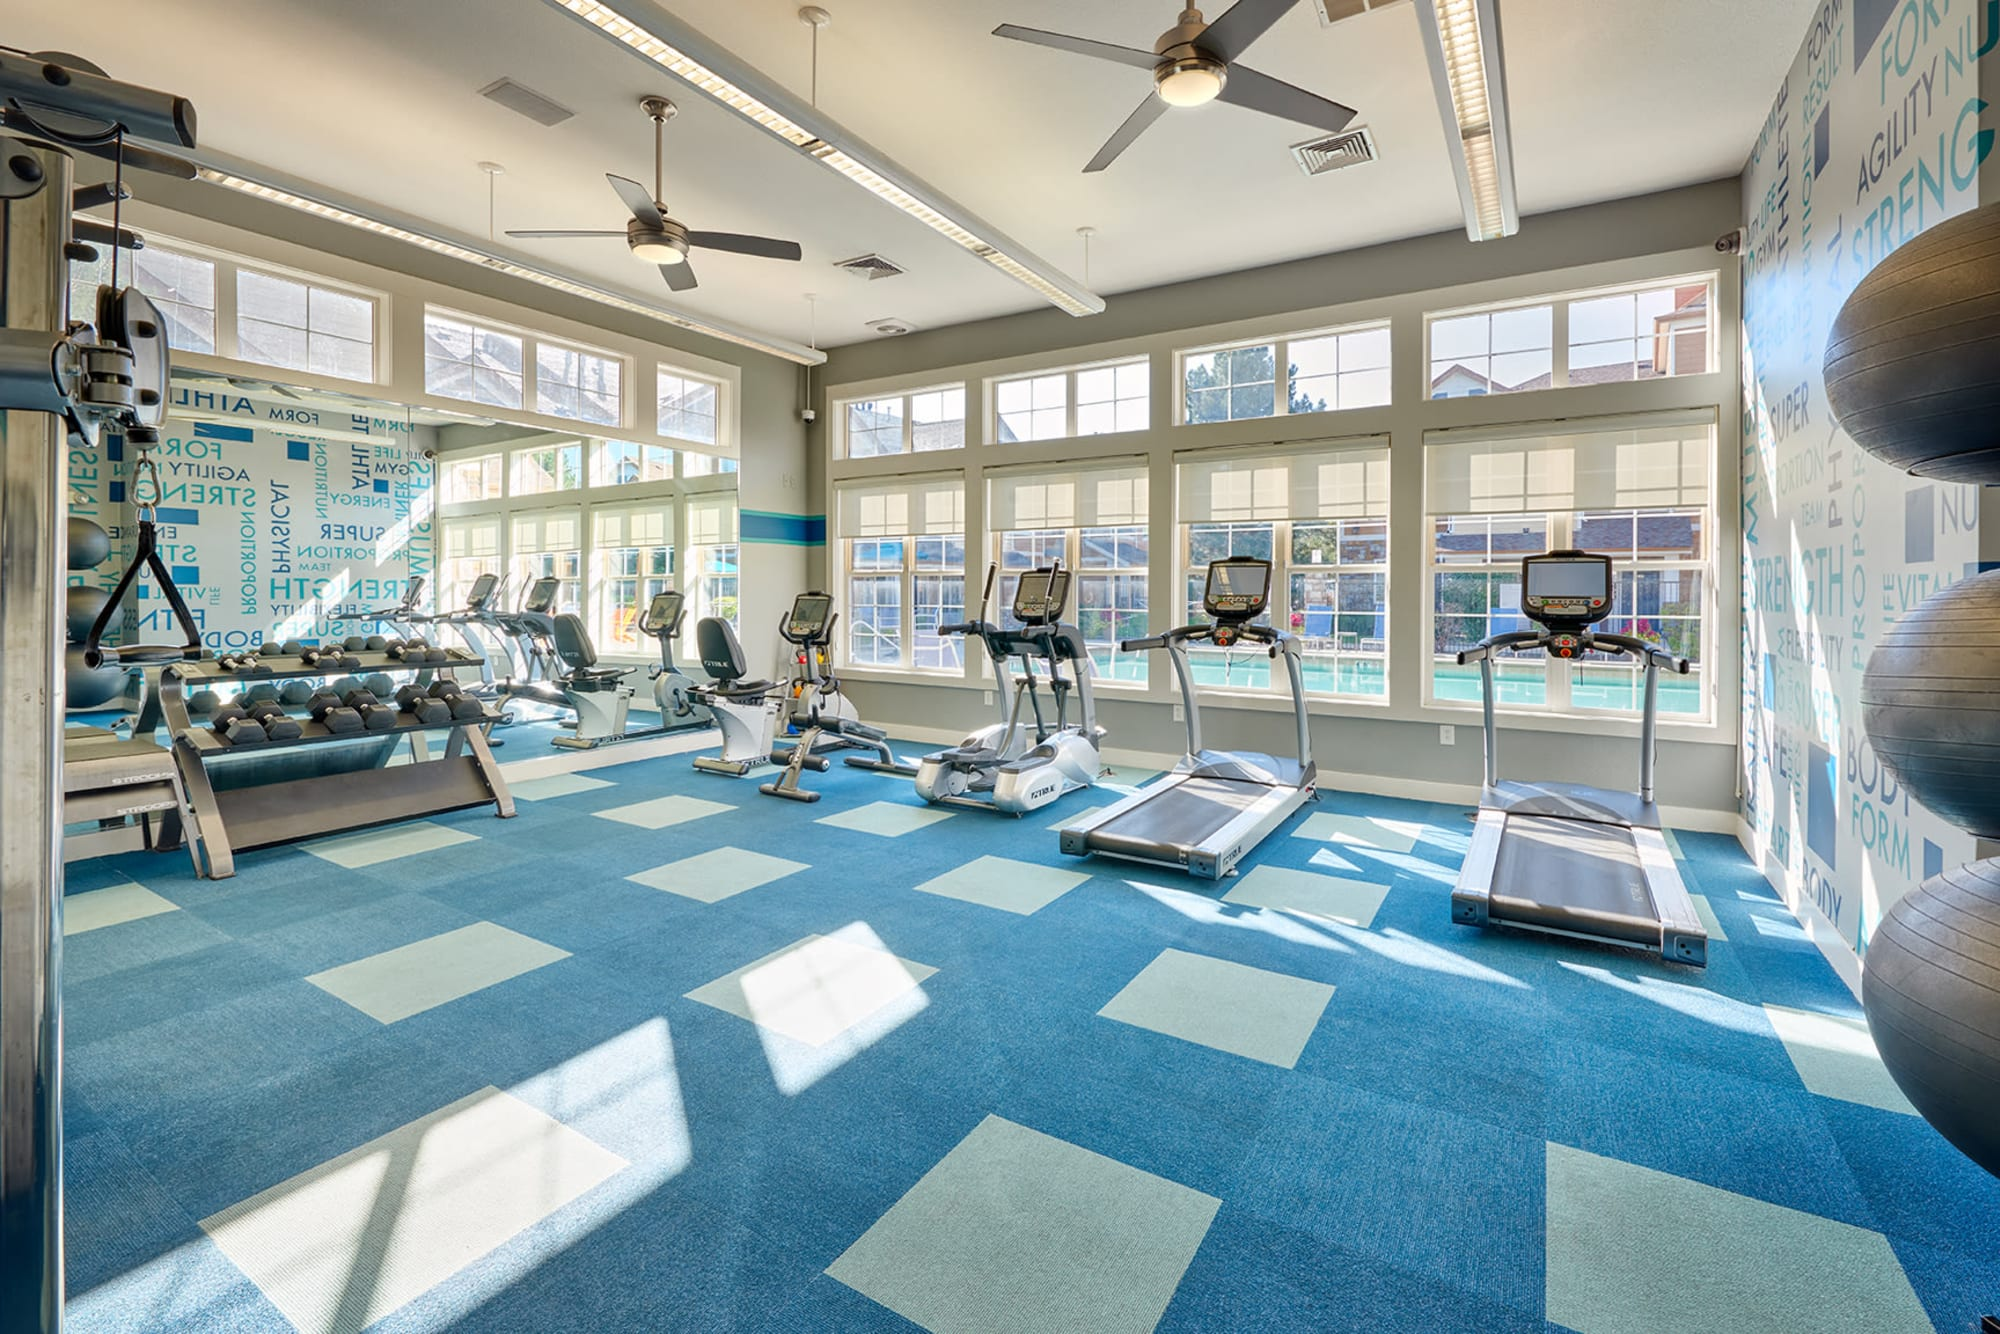 The community fitness center at Crestone Apartments in Aurora, Colorado